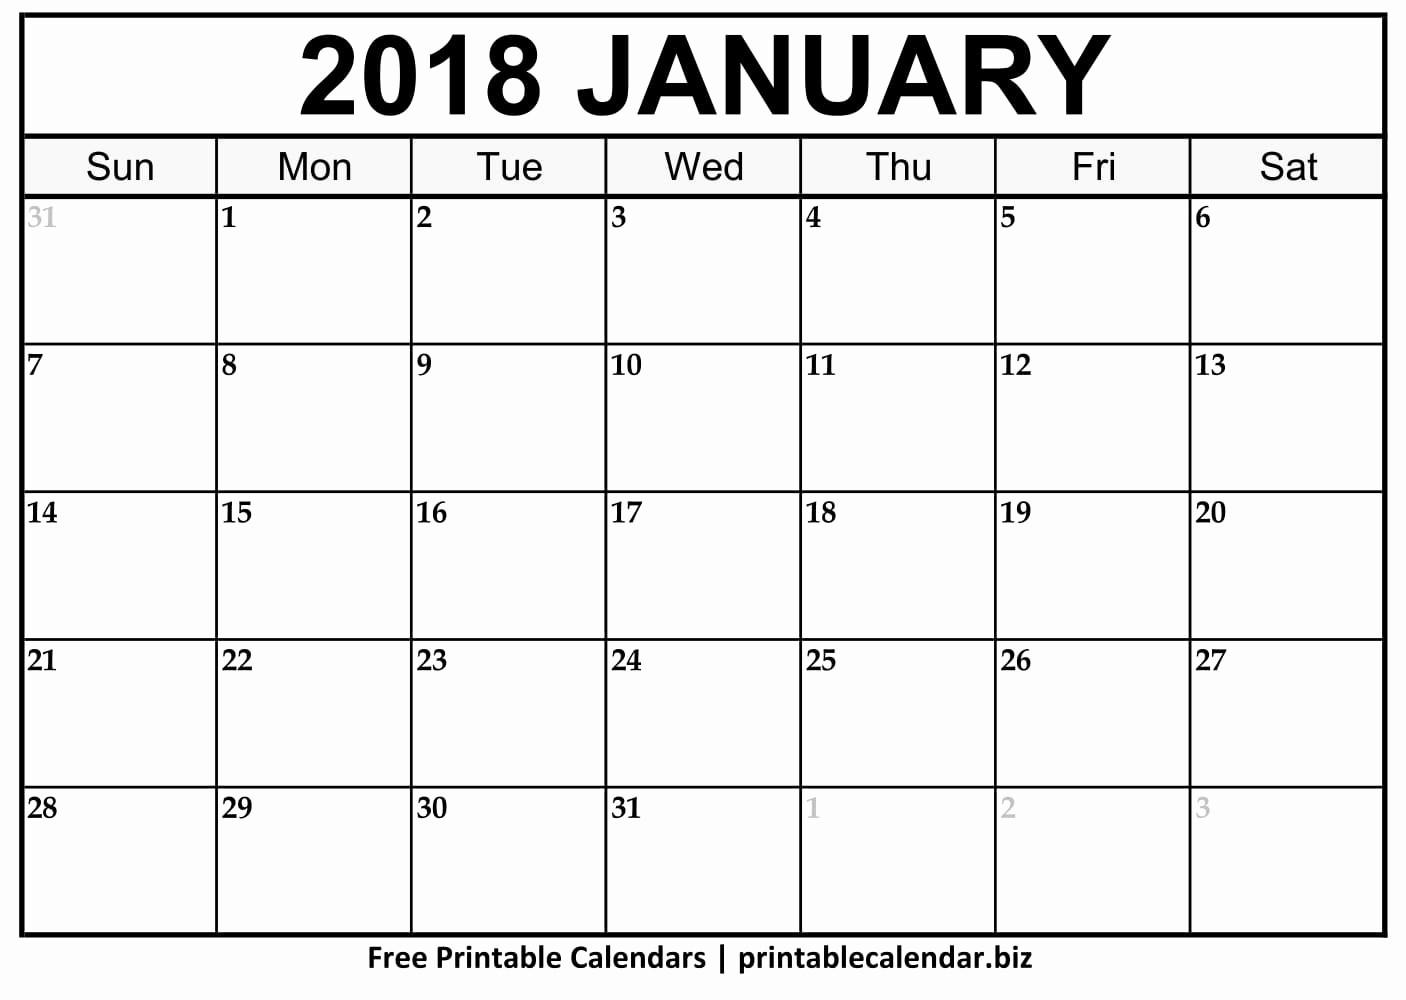 Free Printable 2018 Calendar Templates Best Of Printable 2018 Calendar 123calendars